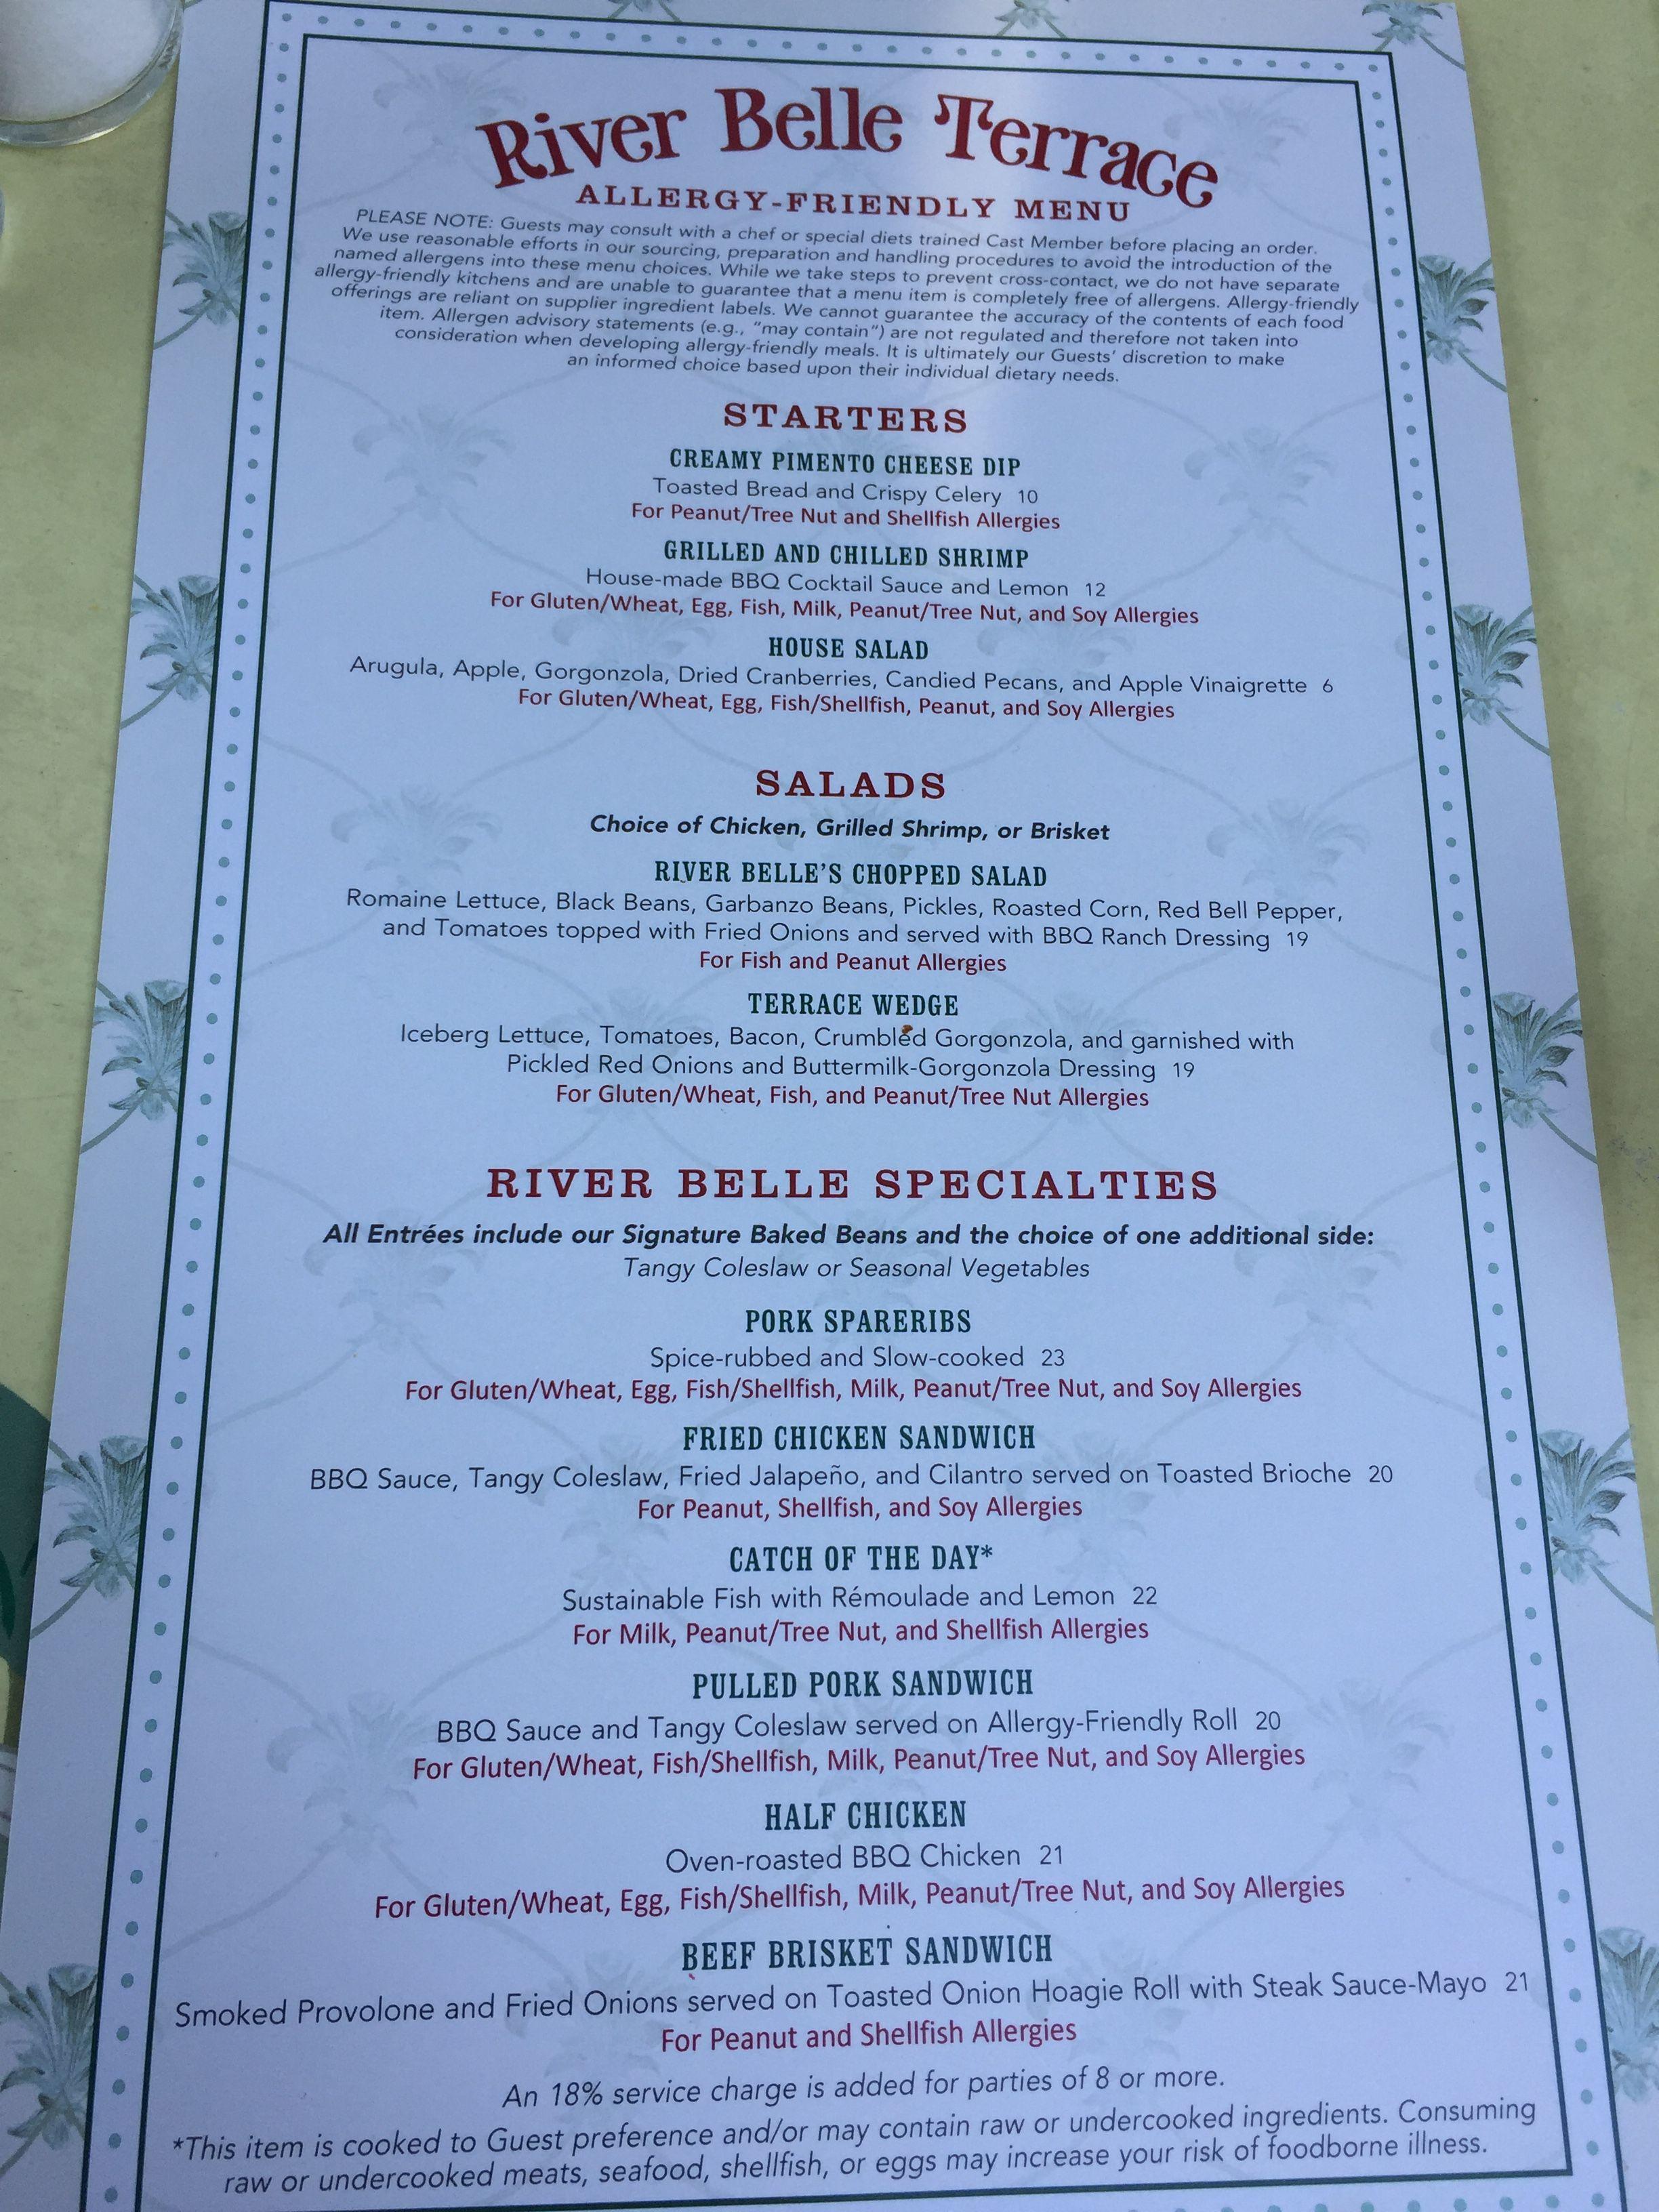 Disneyland River Belle Terrace Allergy Menu | Gluten free ...